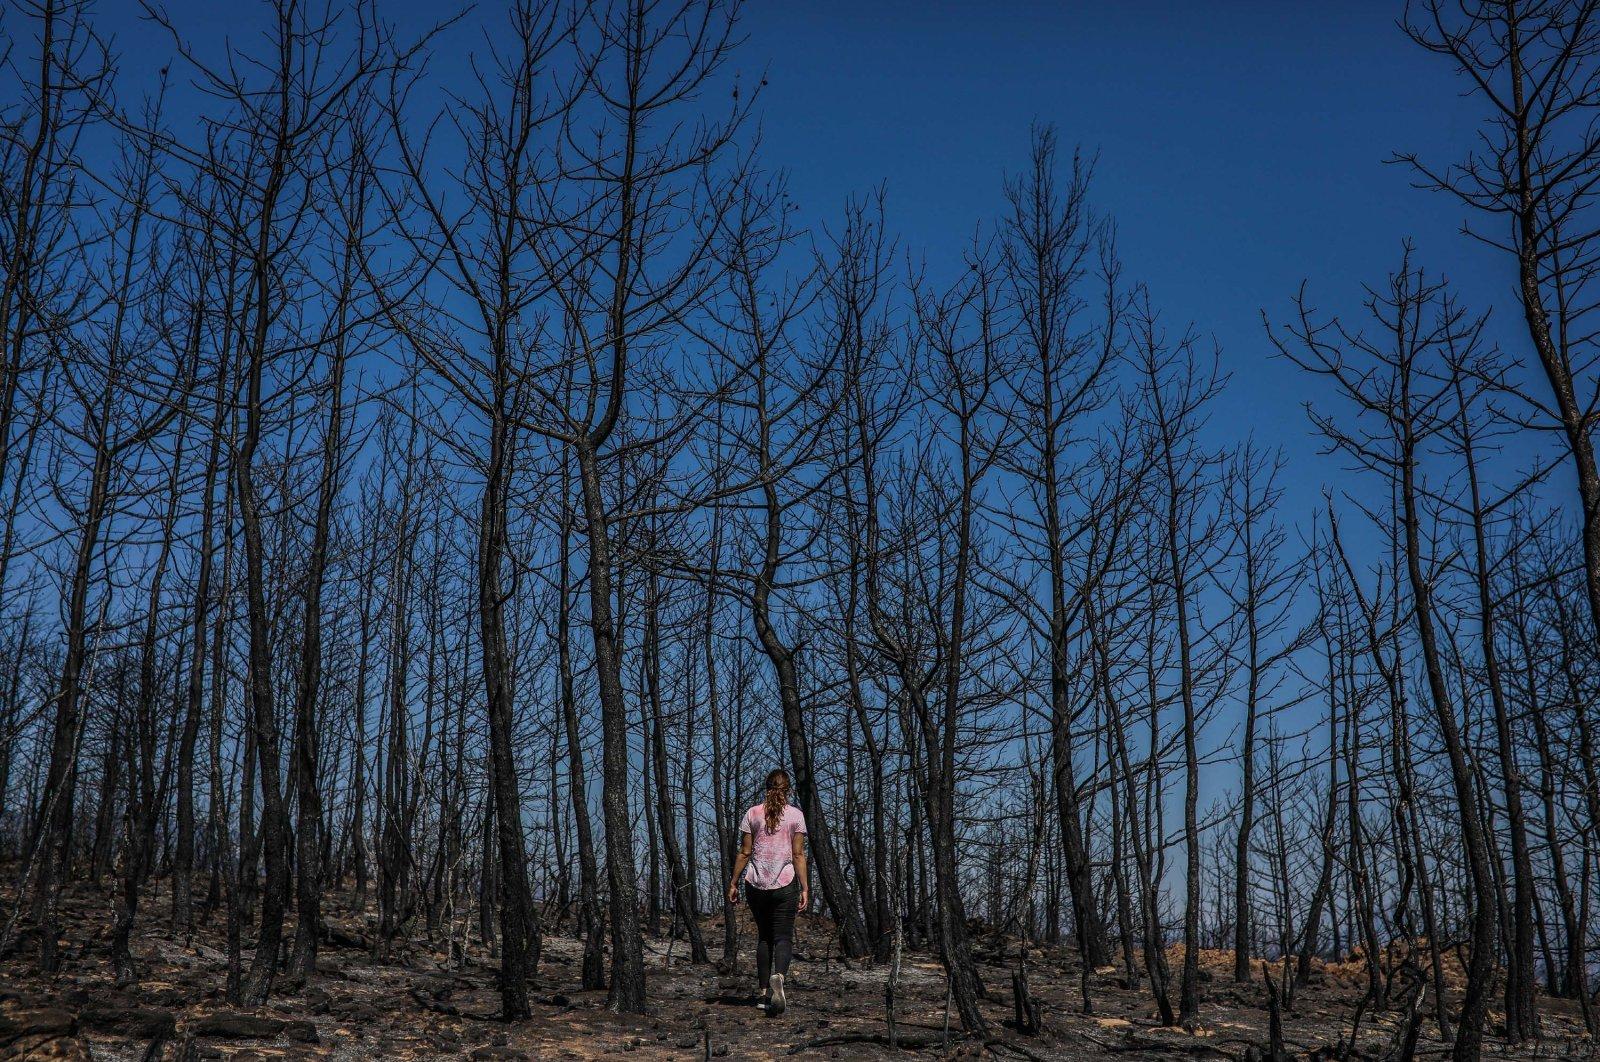 A woman walks among burned trees in Manavgat, Antalya, Aug. 20, 2021. (DHA Photo)